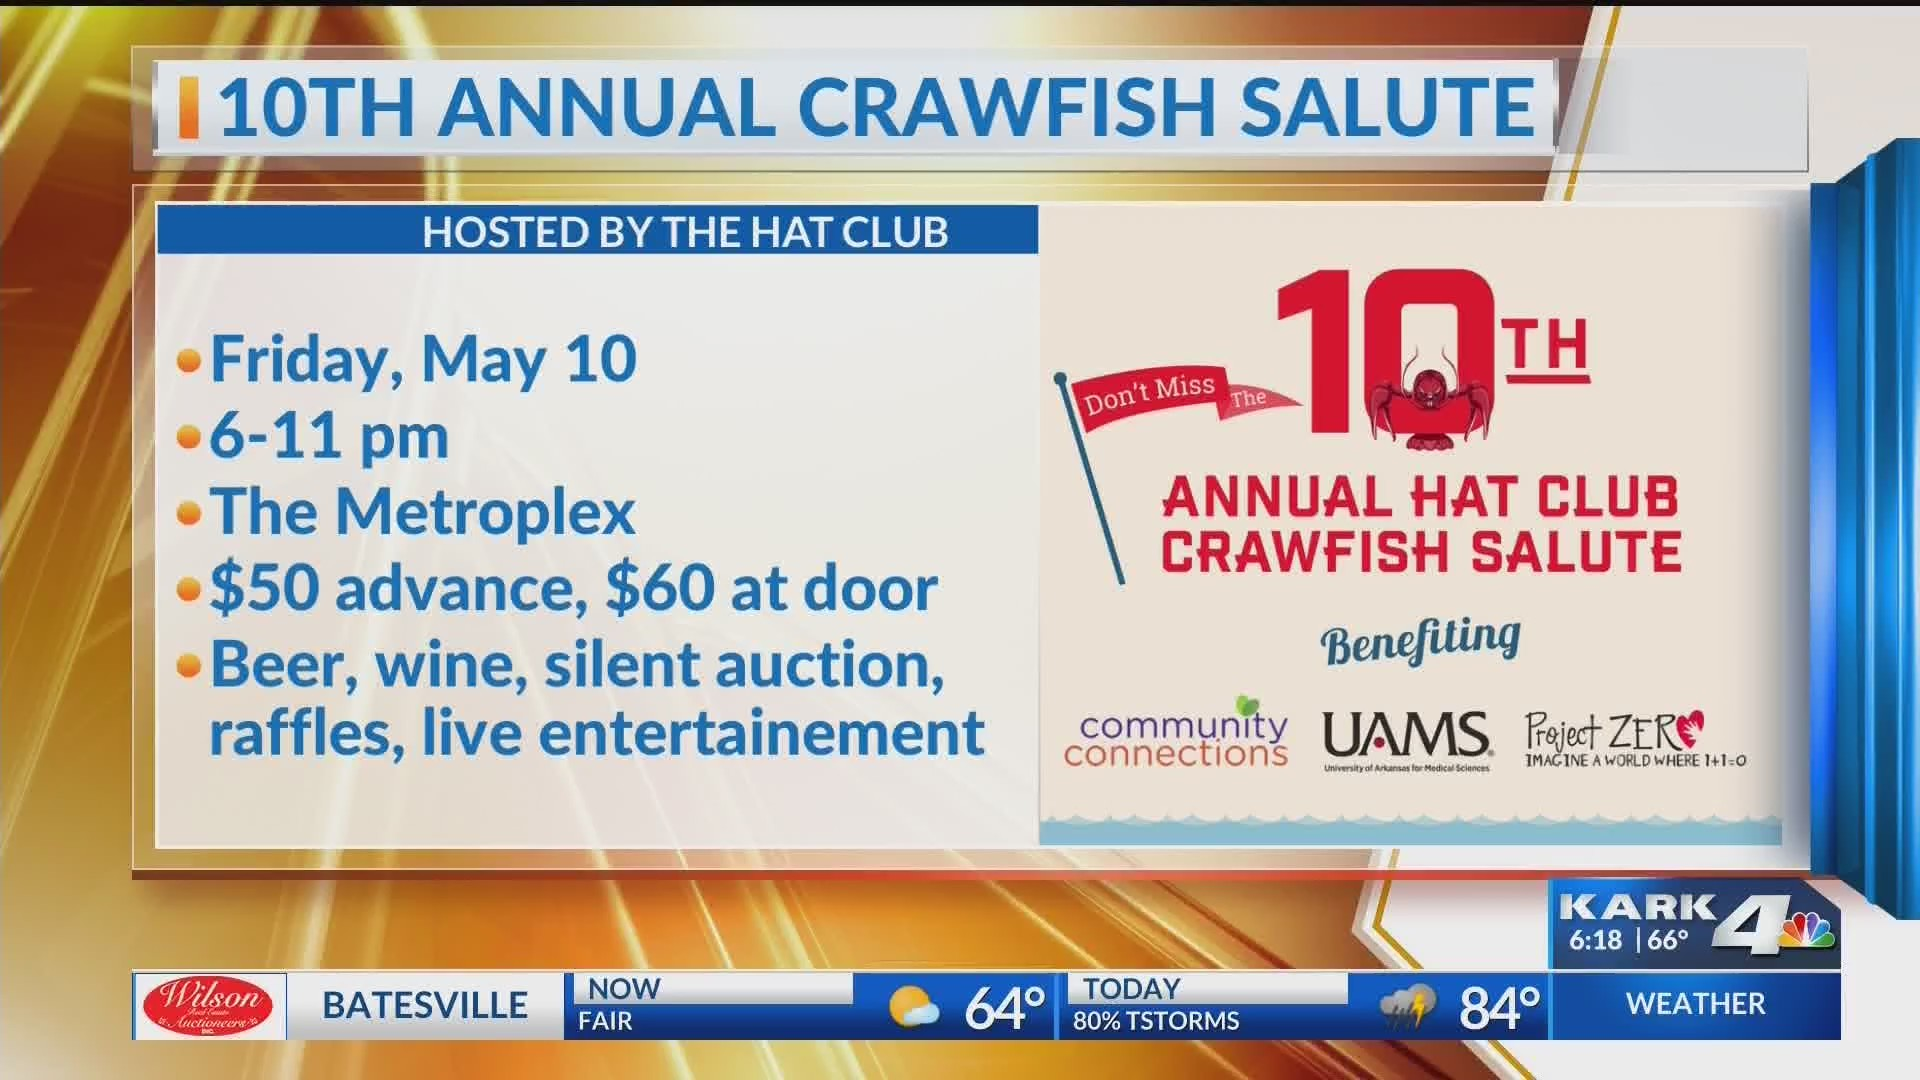 Crawfish Salute